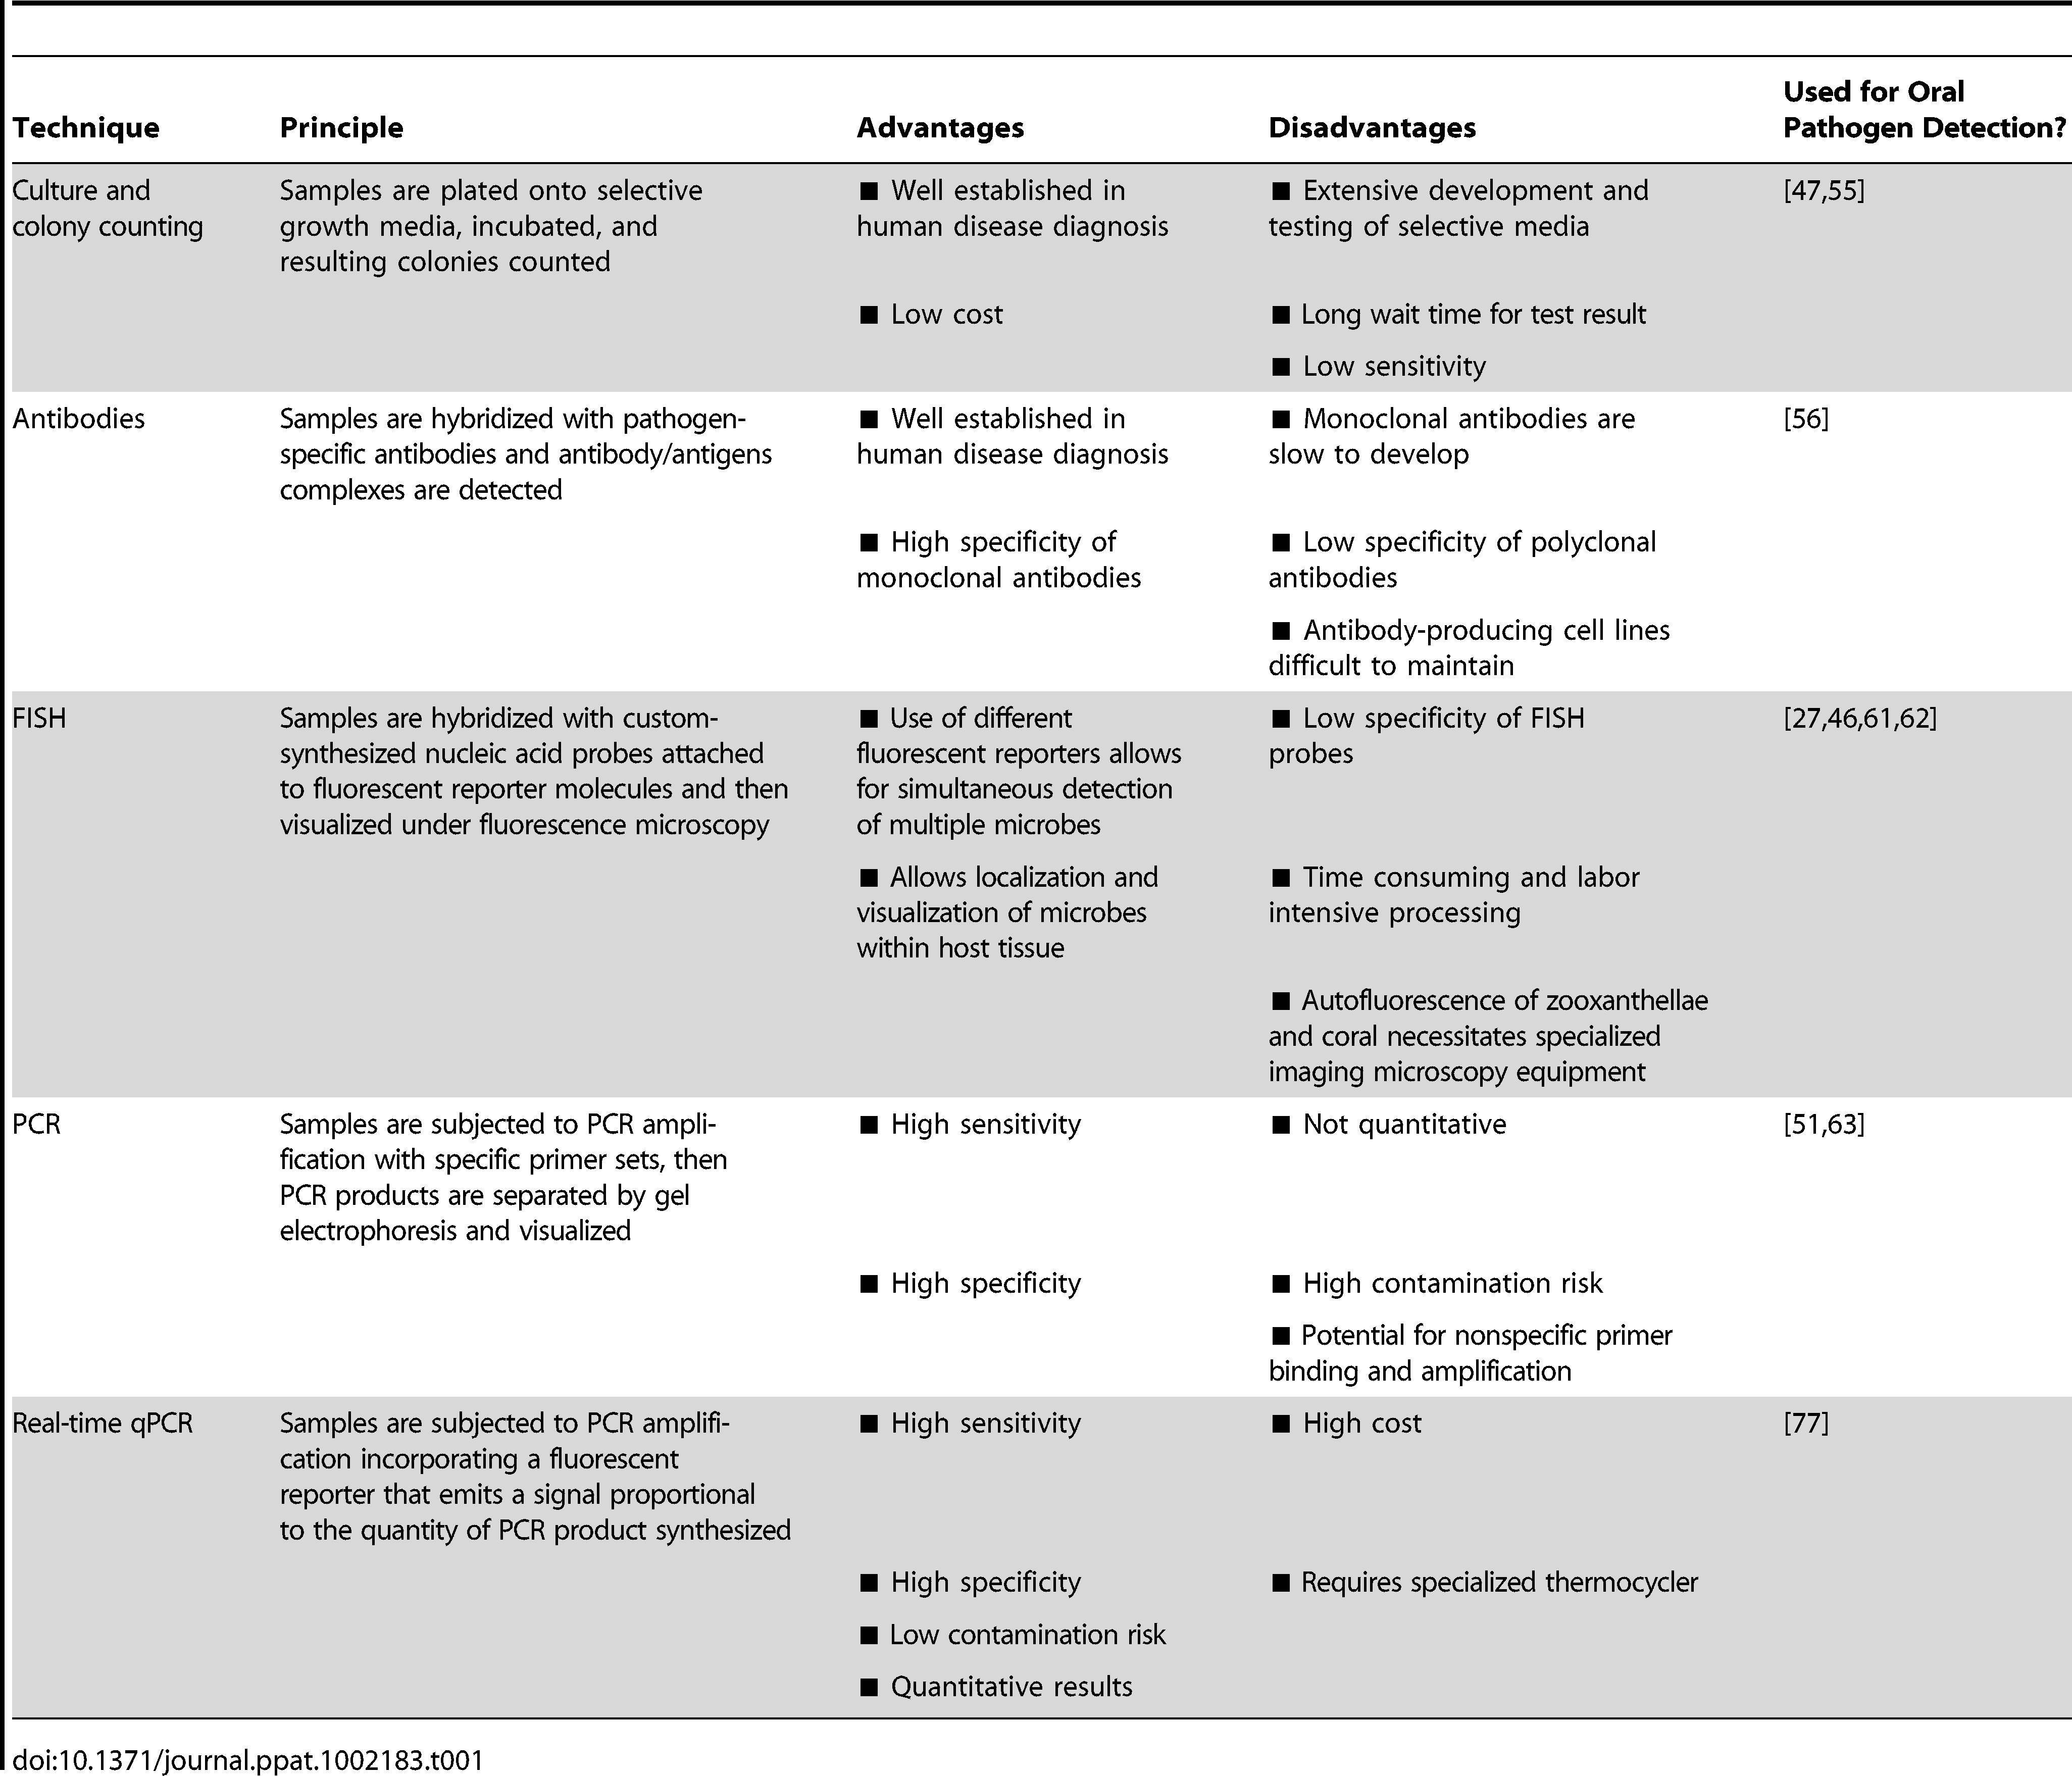 Summary of pathogen detection techniques and molecular diagnostics.